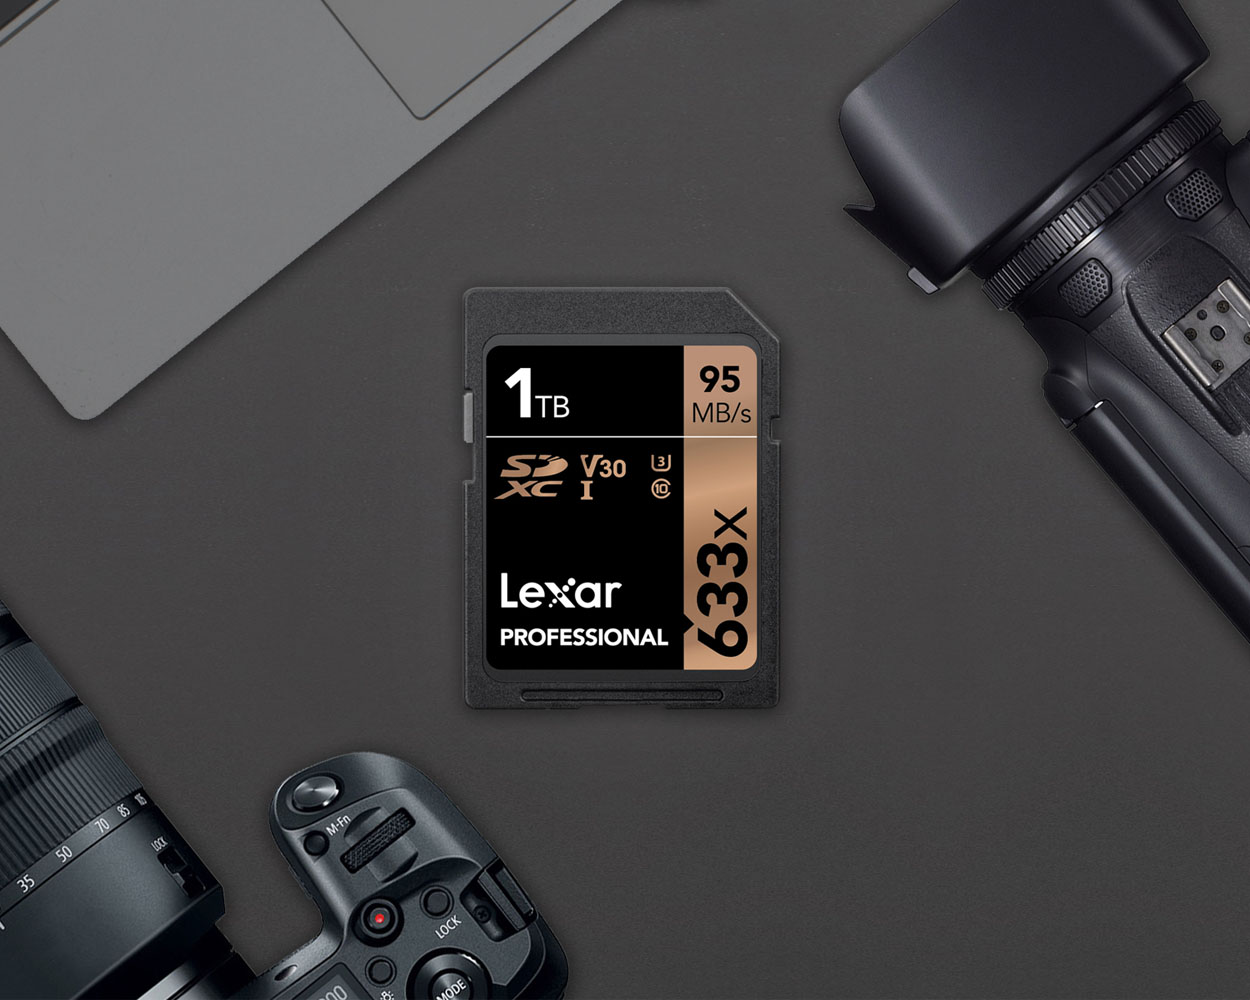 https://images.frandroid.com/wp-content/uploads/2019/01/lexar_sd_633x_1tb_pr.jpg